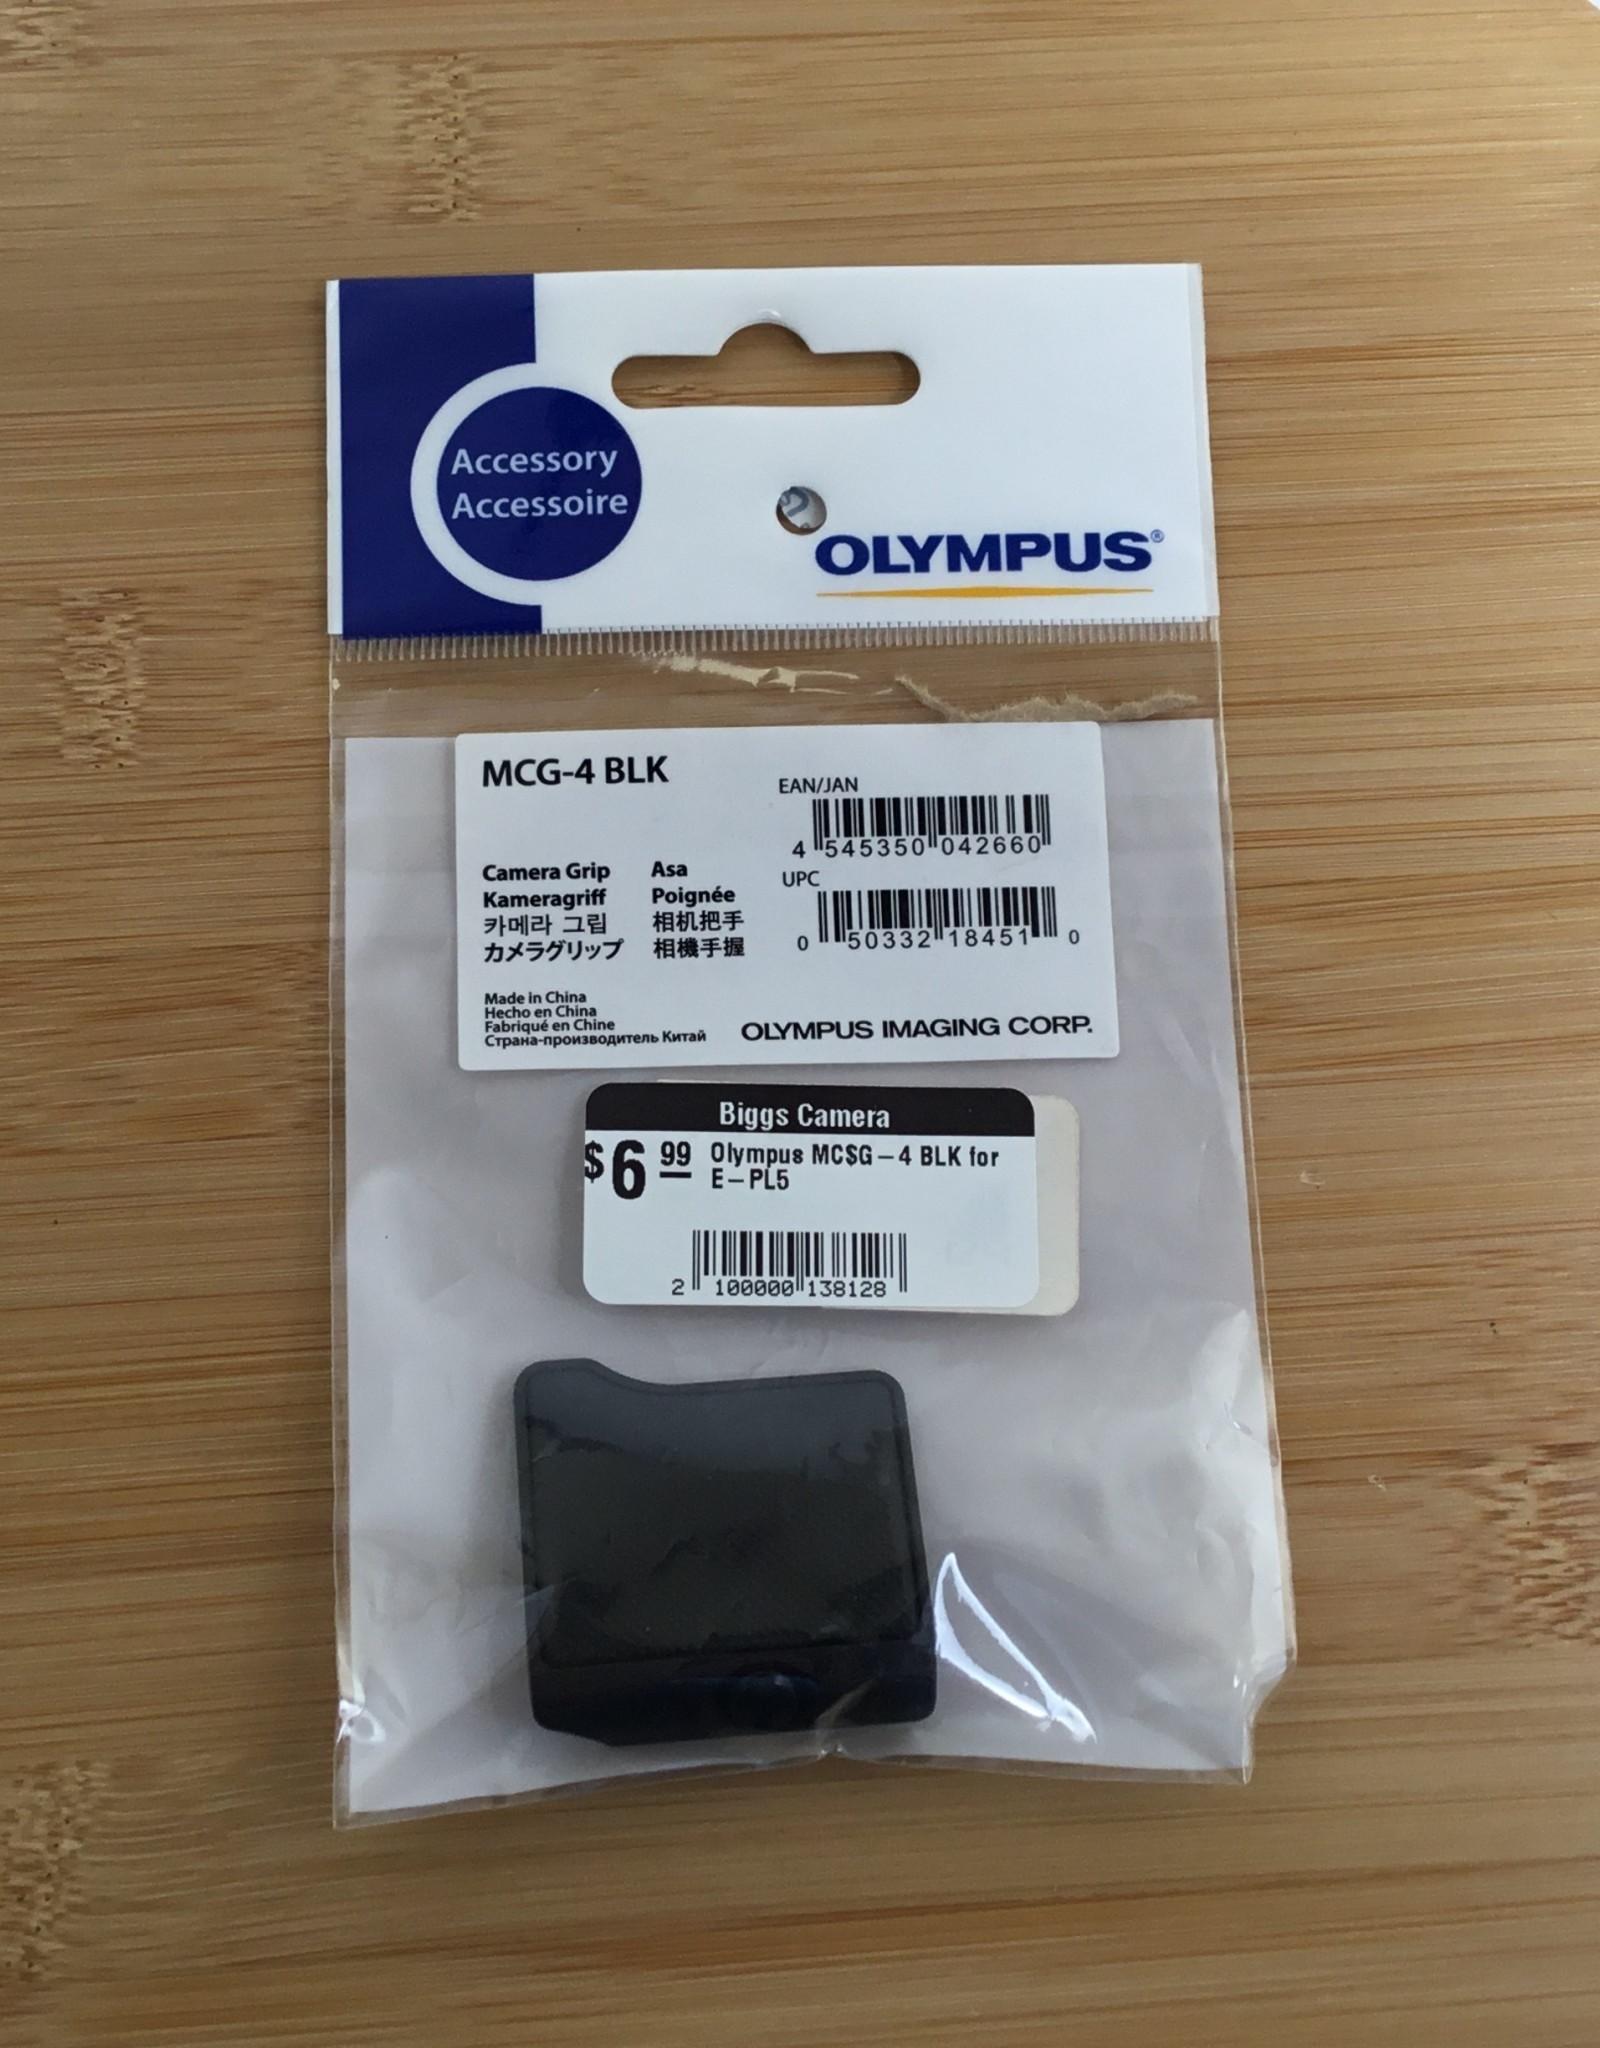 OLYMPUS Olympus MCG-4 BLK for E-PL5 Used LN